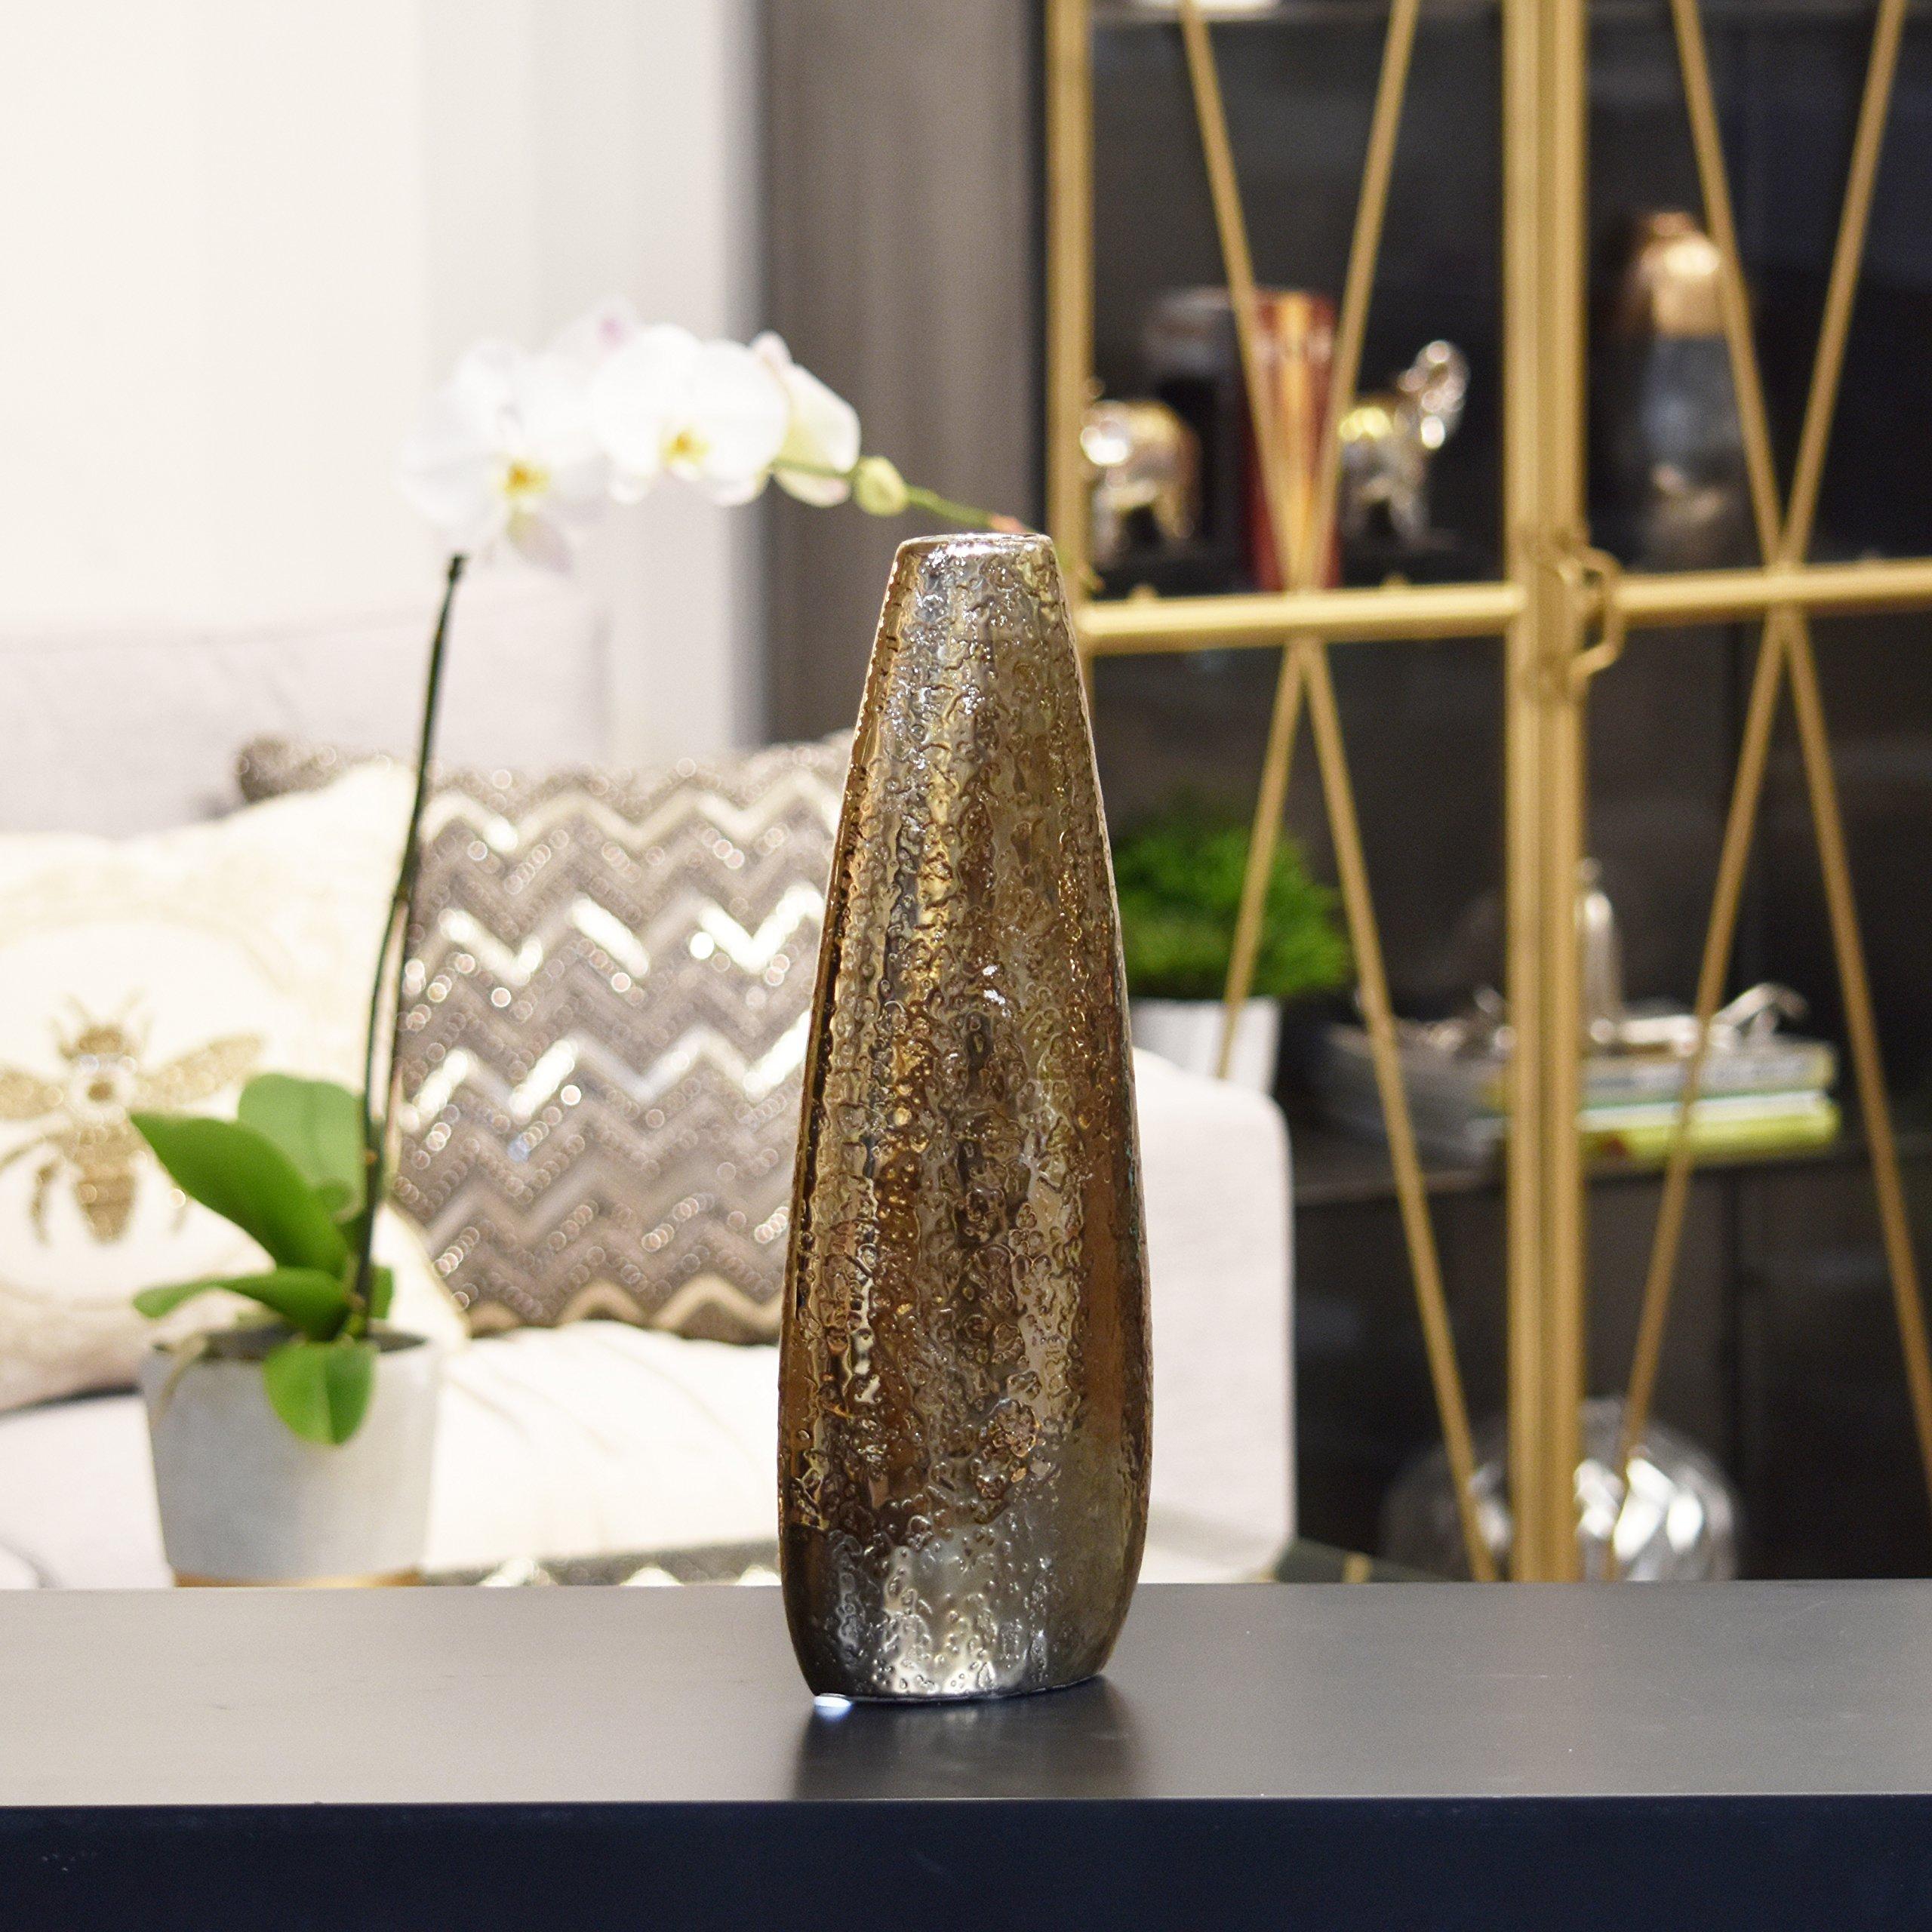 UTC 25001 Red Ceramic Vase with Golden Bottleneck Finish